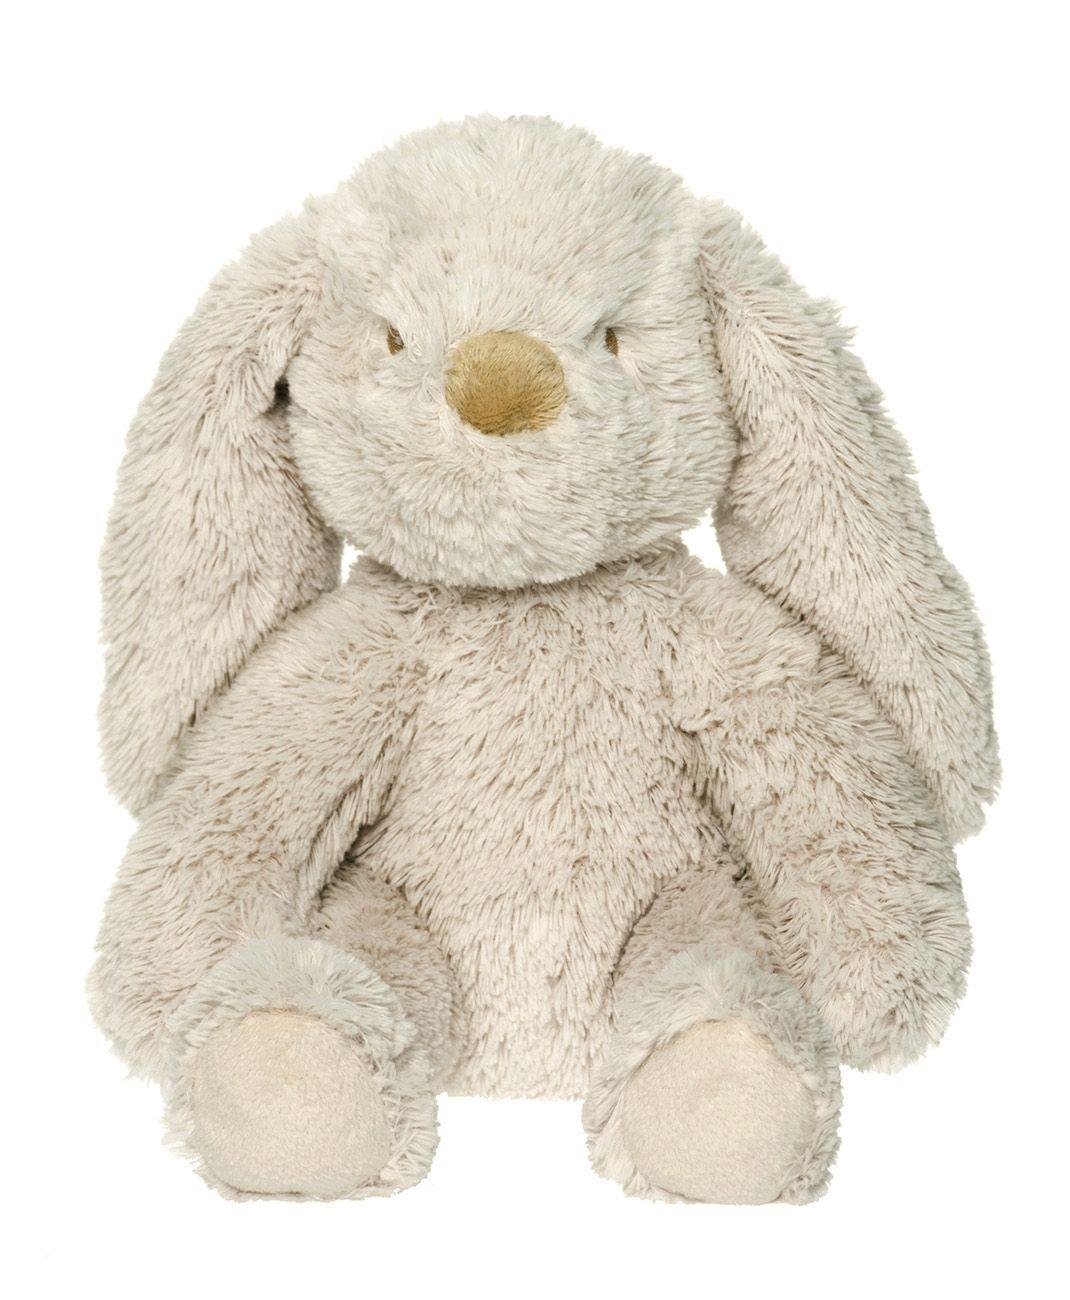 Image of Kanin fra Teddykompaniet - Lolli - Grå (25 cm) (2561)